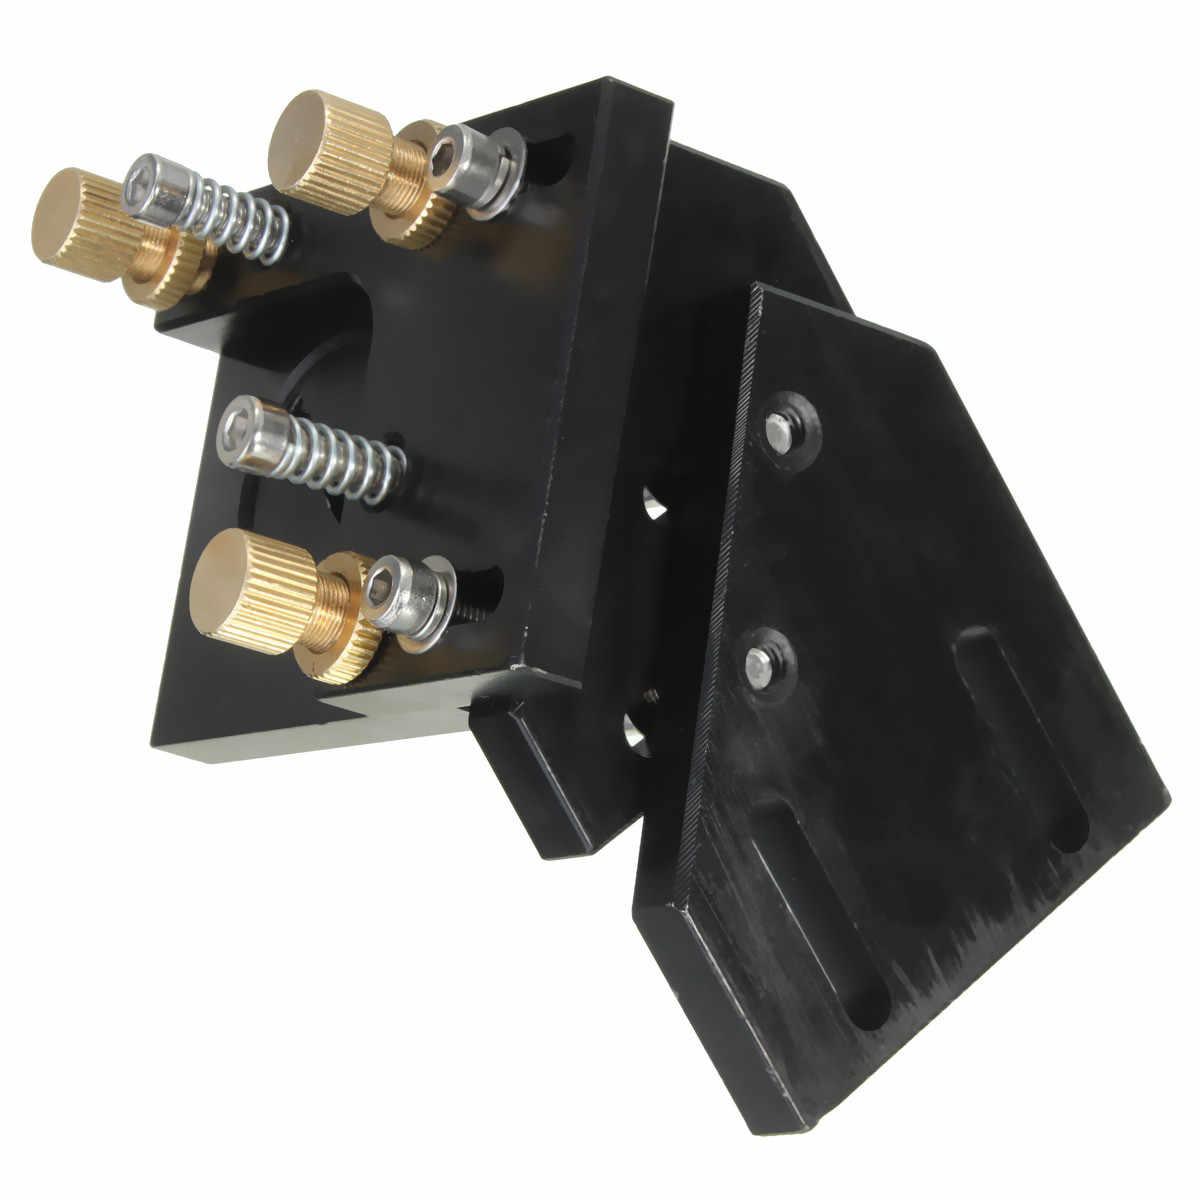 CO2 לייזר ראש סט/רעיוני מראה & התמקדות עדשה מתקן אינטגרטיבית הר מחזיק עבור לייזר חרט מכונת חיתוך חלקי